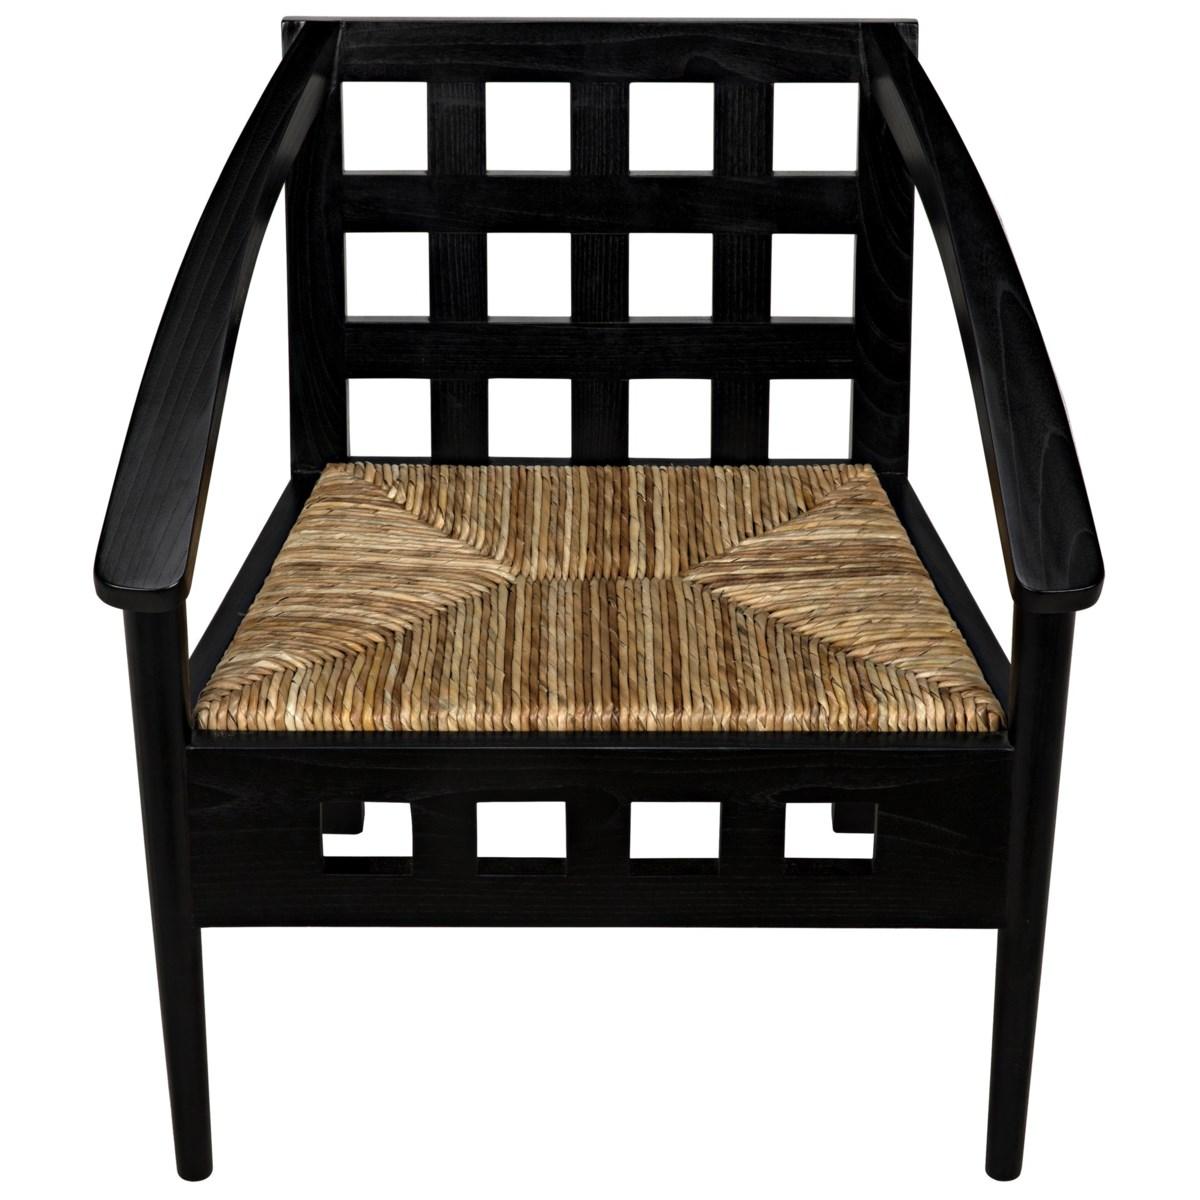 Humboldt Chair, Charcoal Black